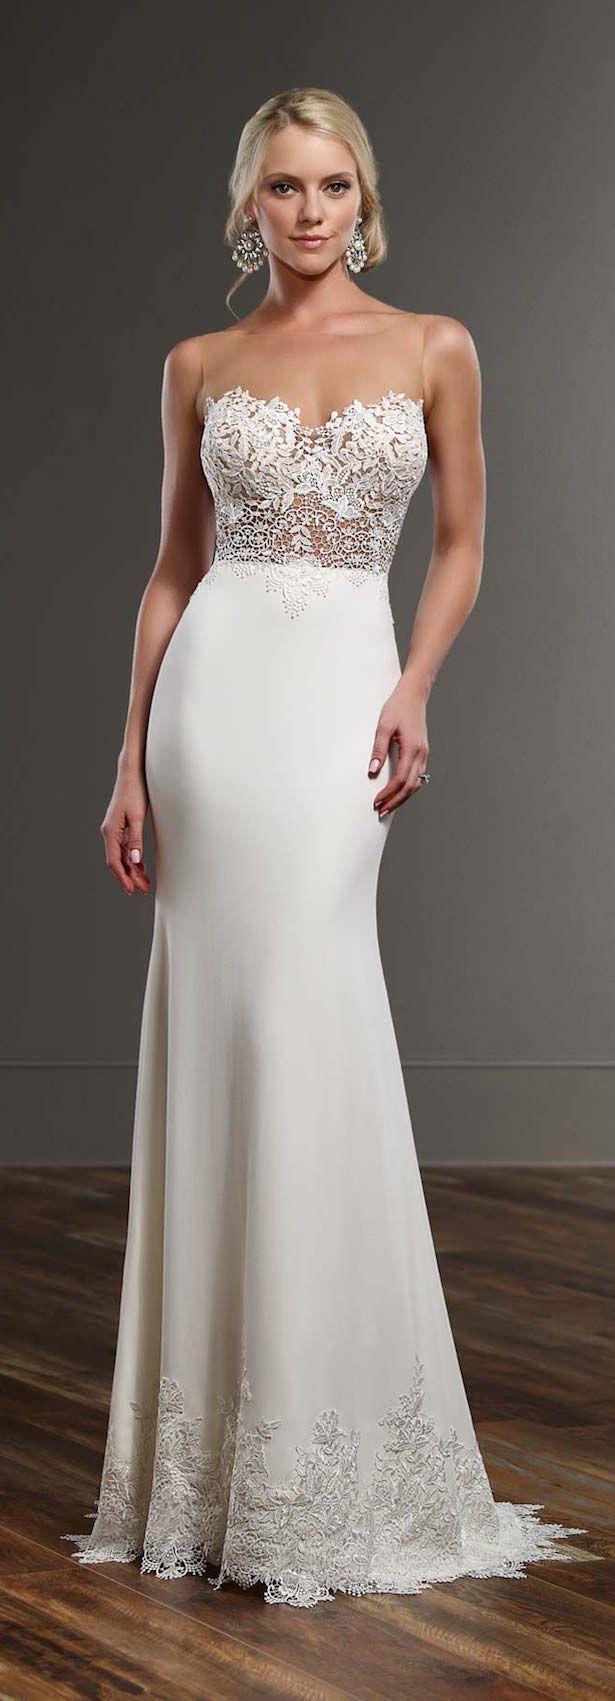 women's bodice best wedding dress Best Wedding Dresses of